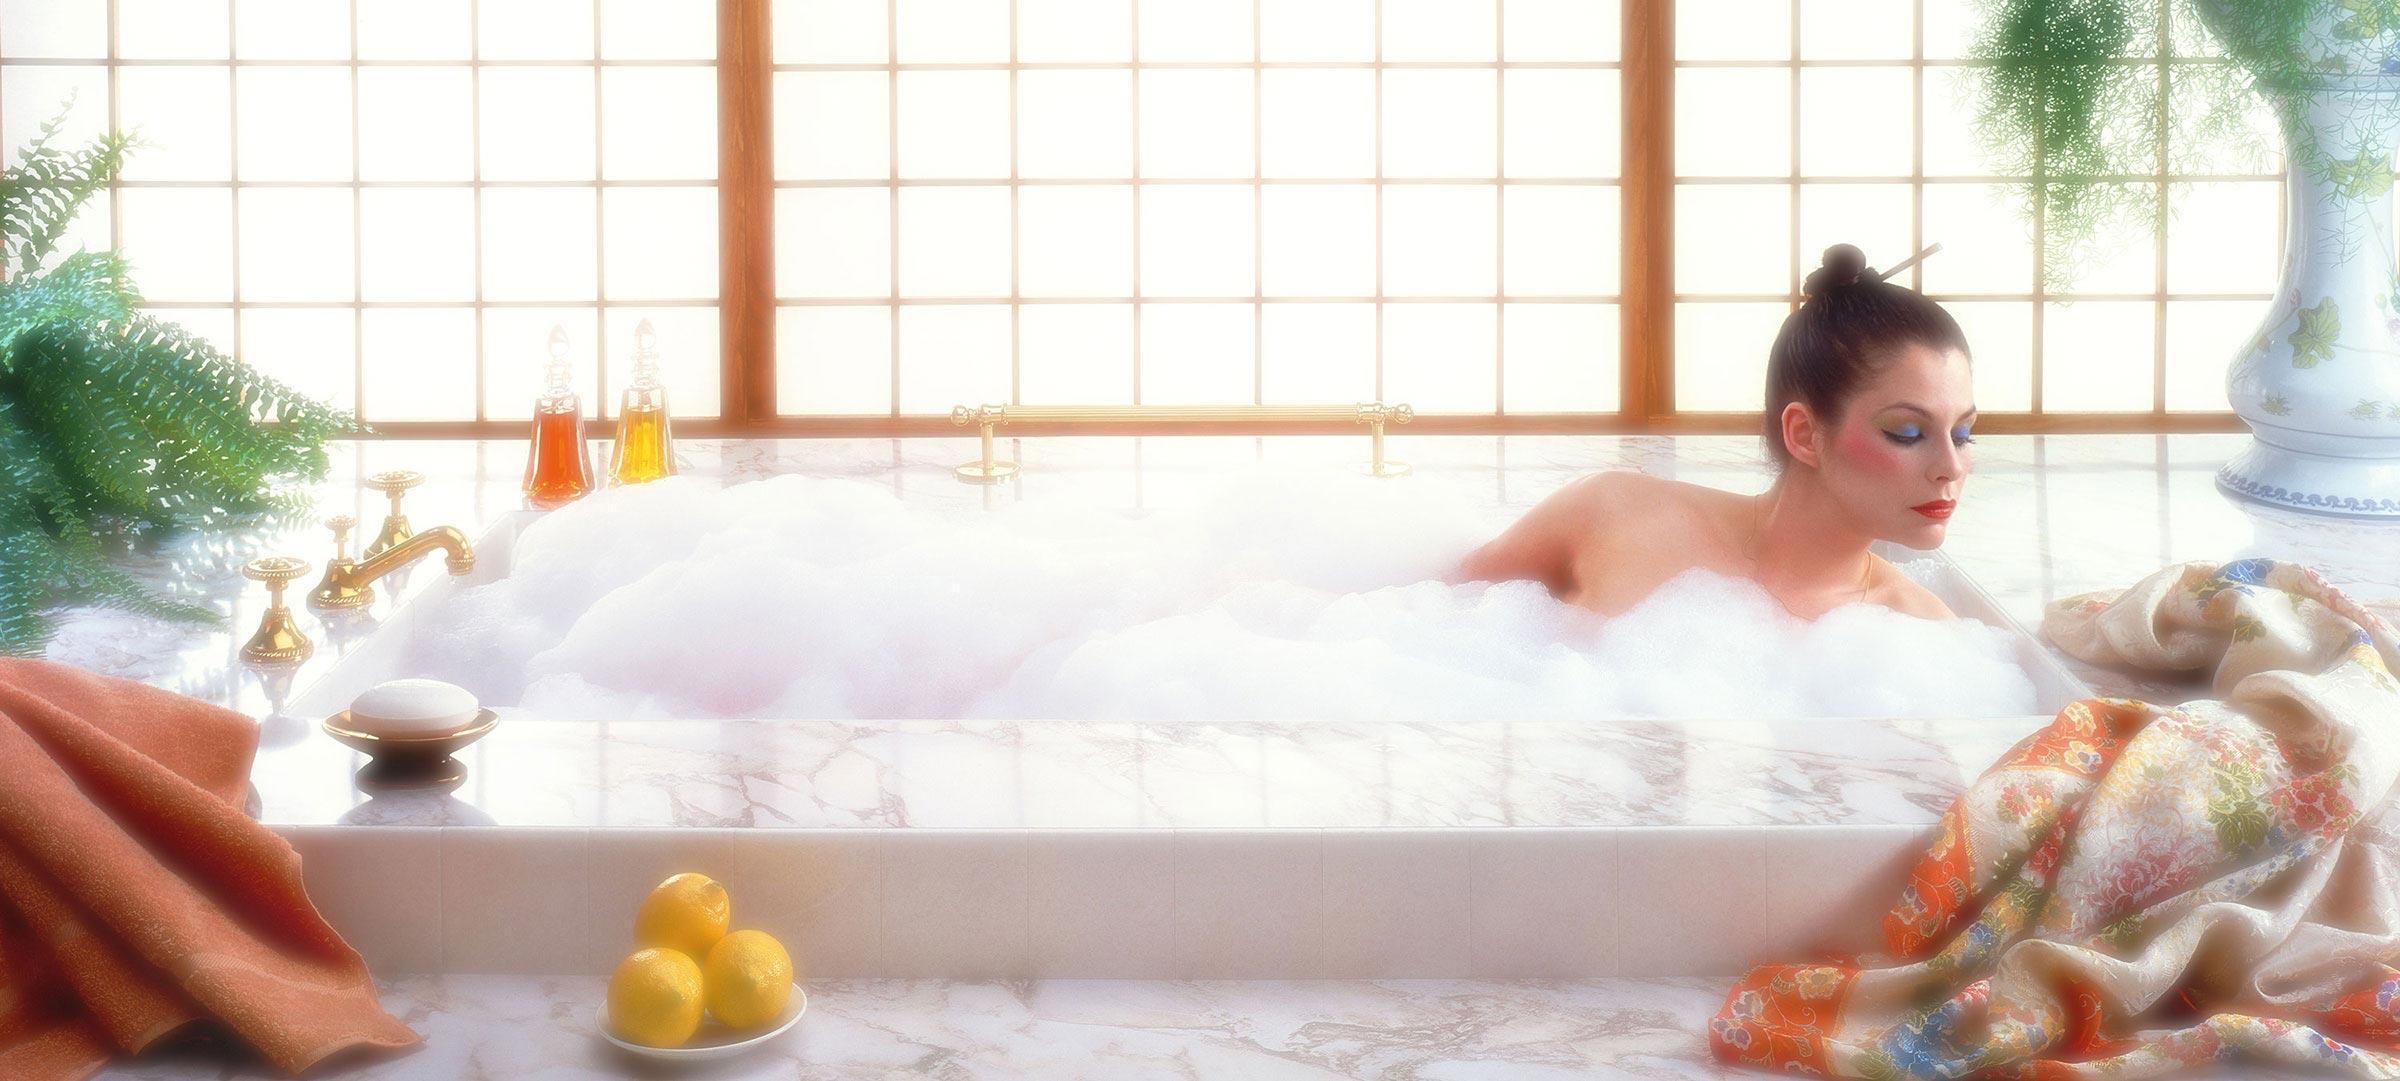 beautiful-woman-in-marble-tub.jpg